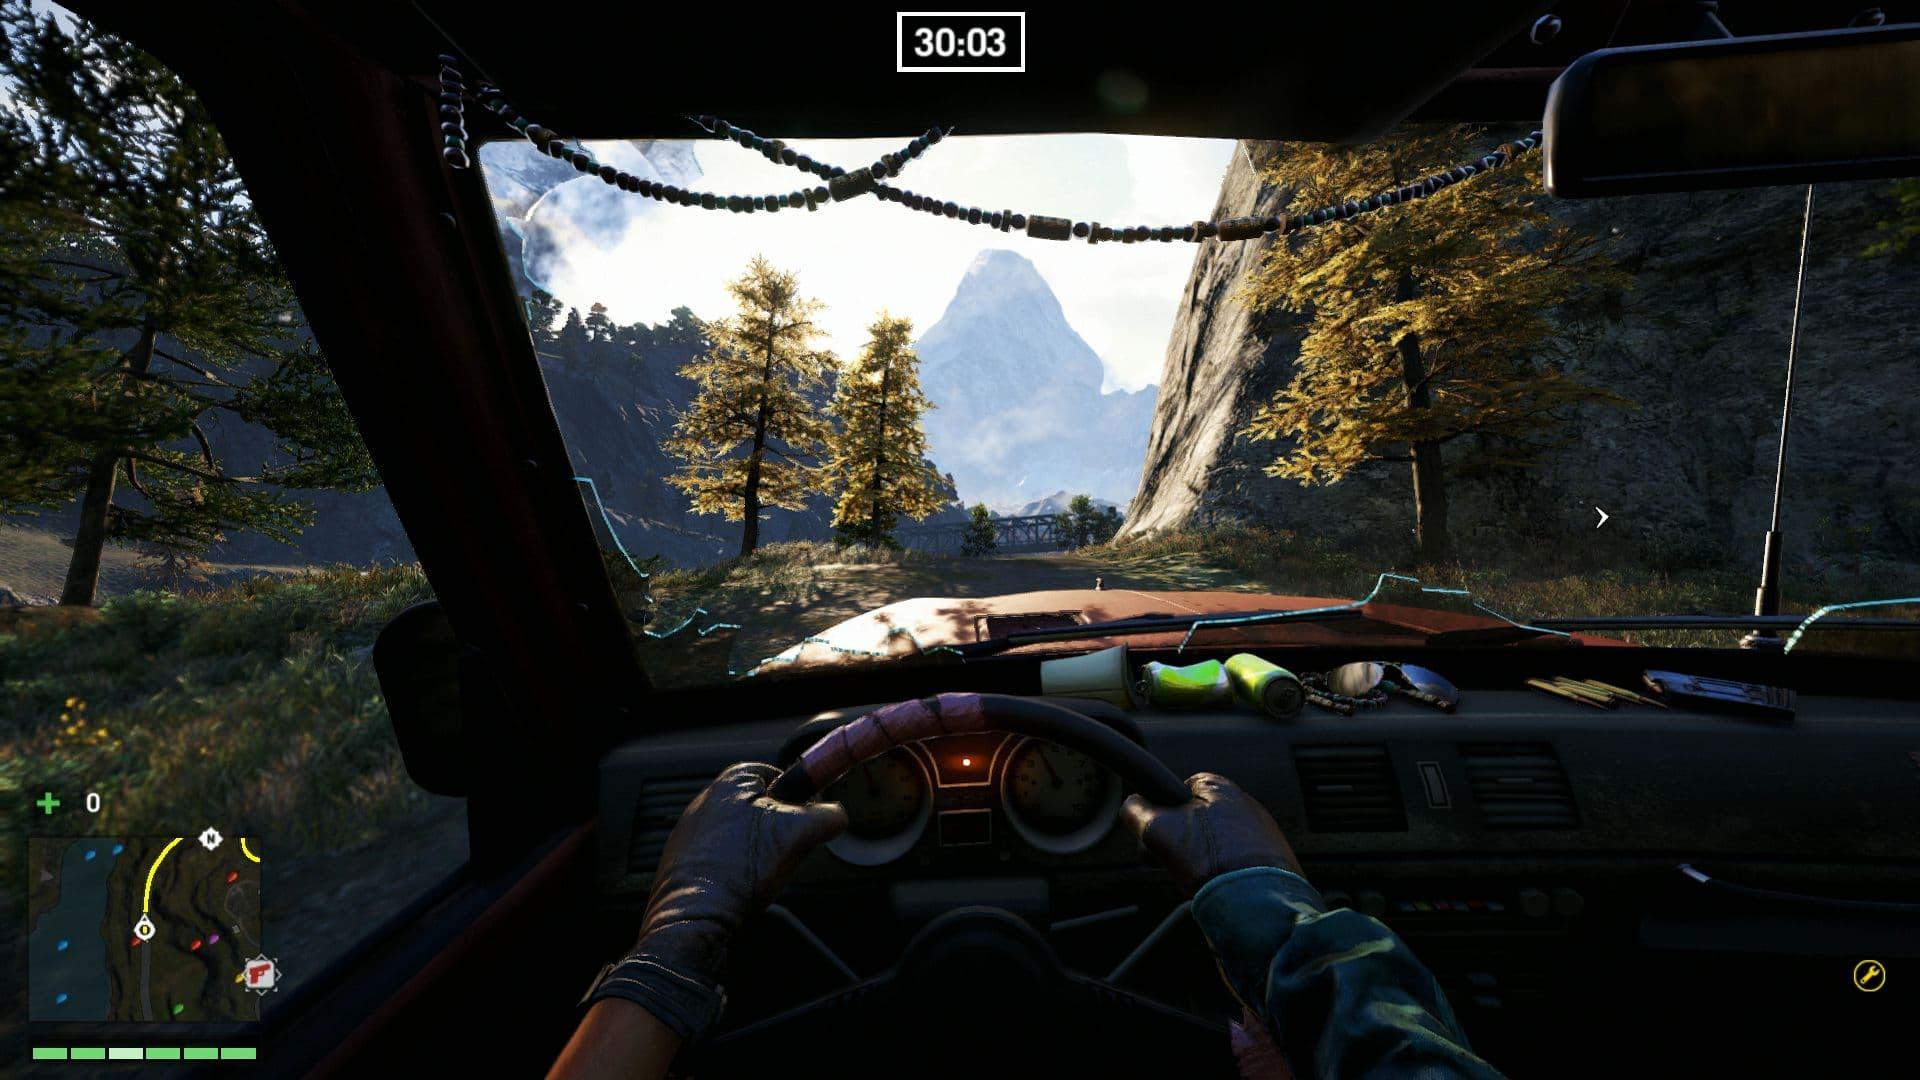 Xbox One Far Cry 4: Escape from Durgesh Prison